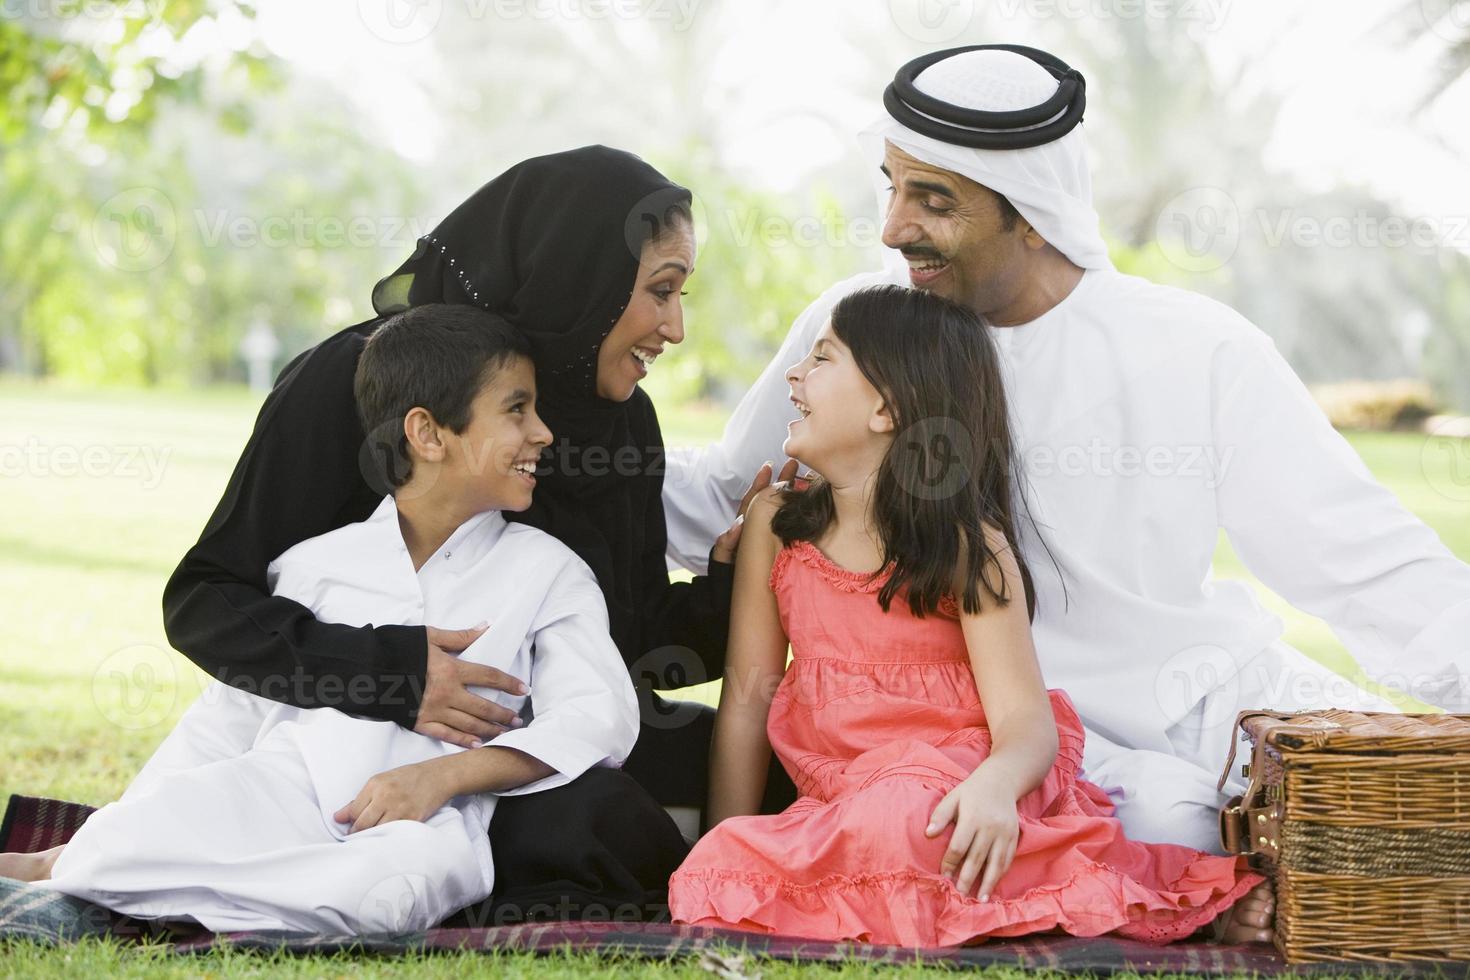 Mellanöstern familj sitter i en park foto